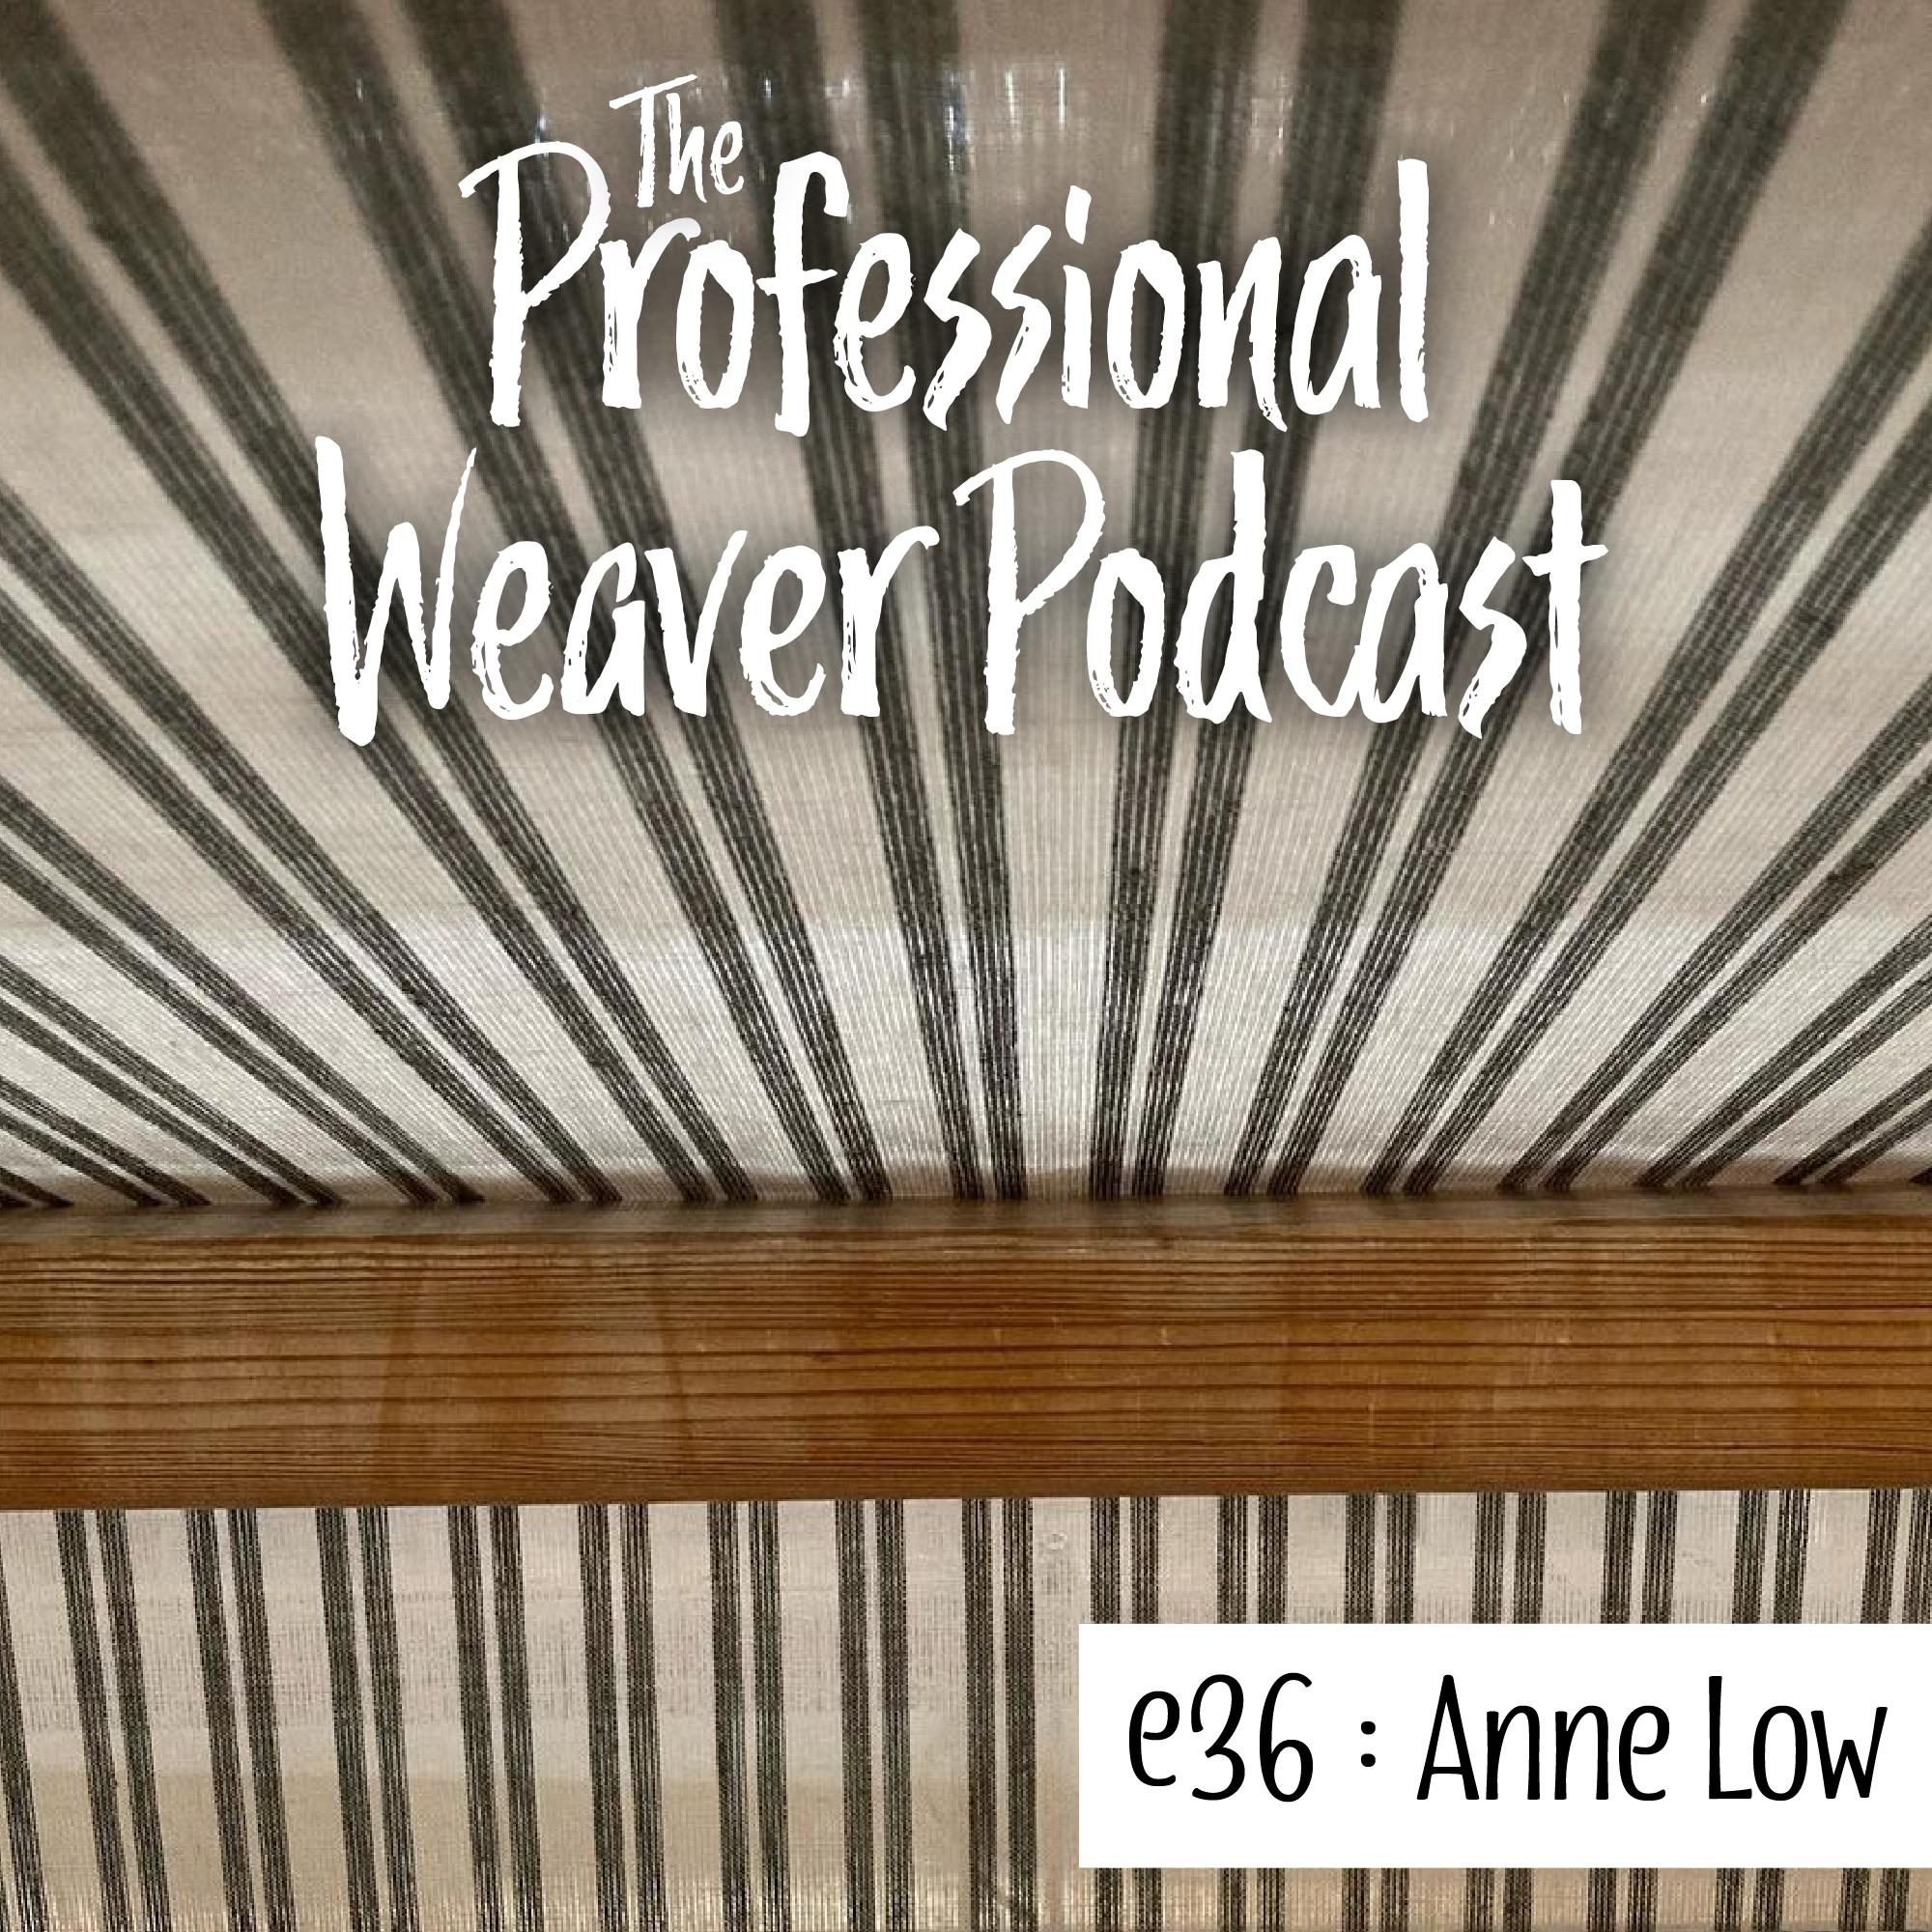 Episode 36 : Anne Low